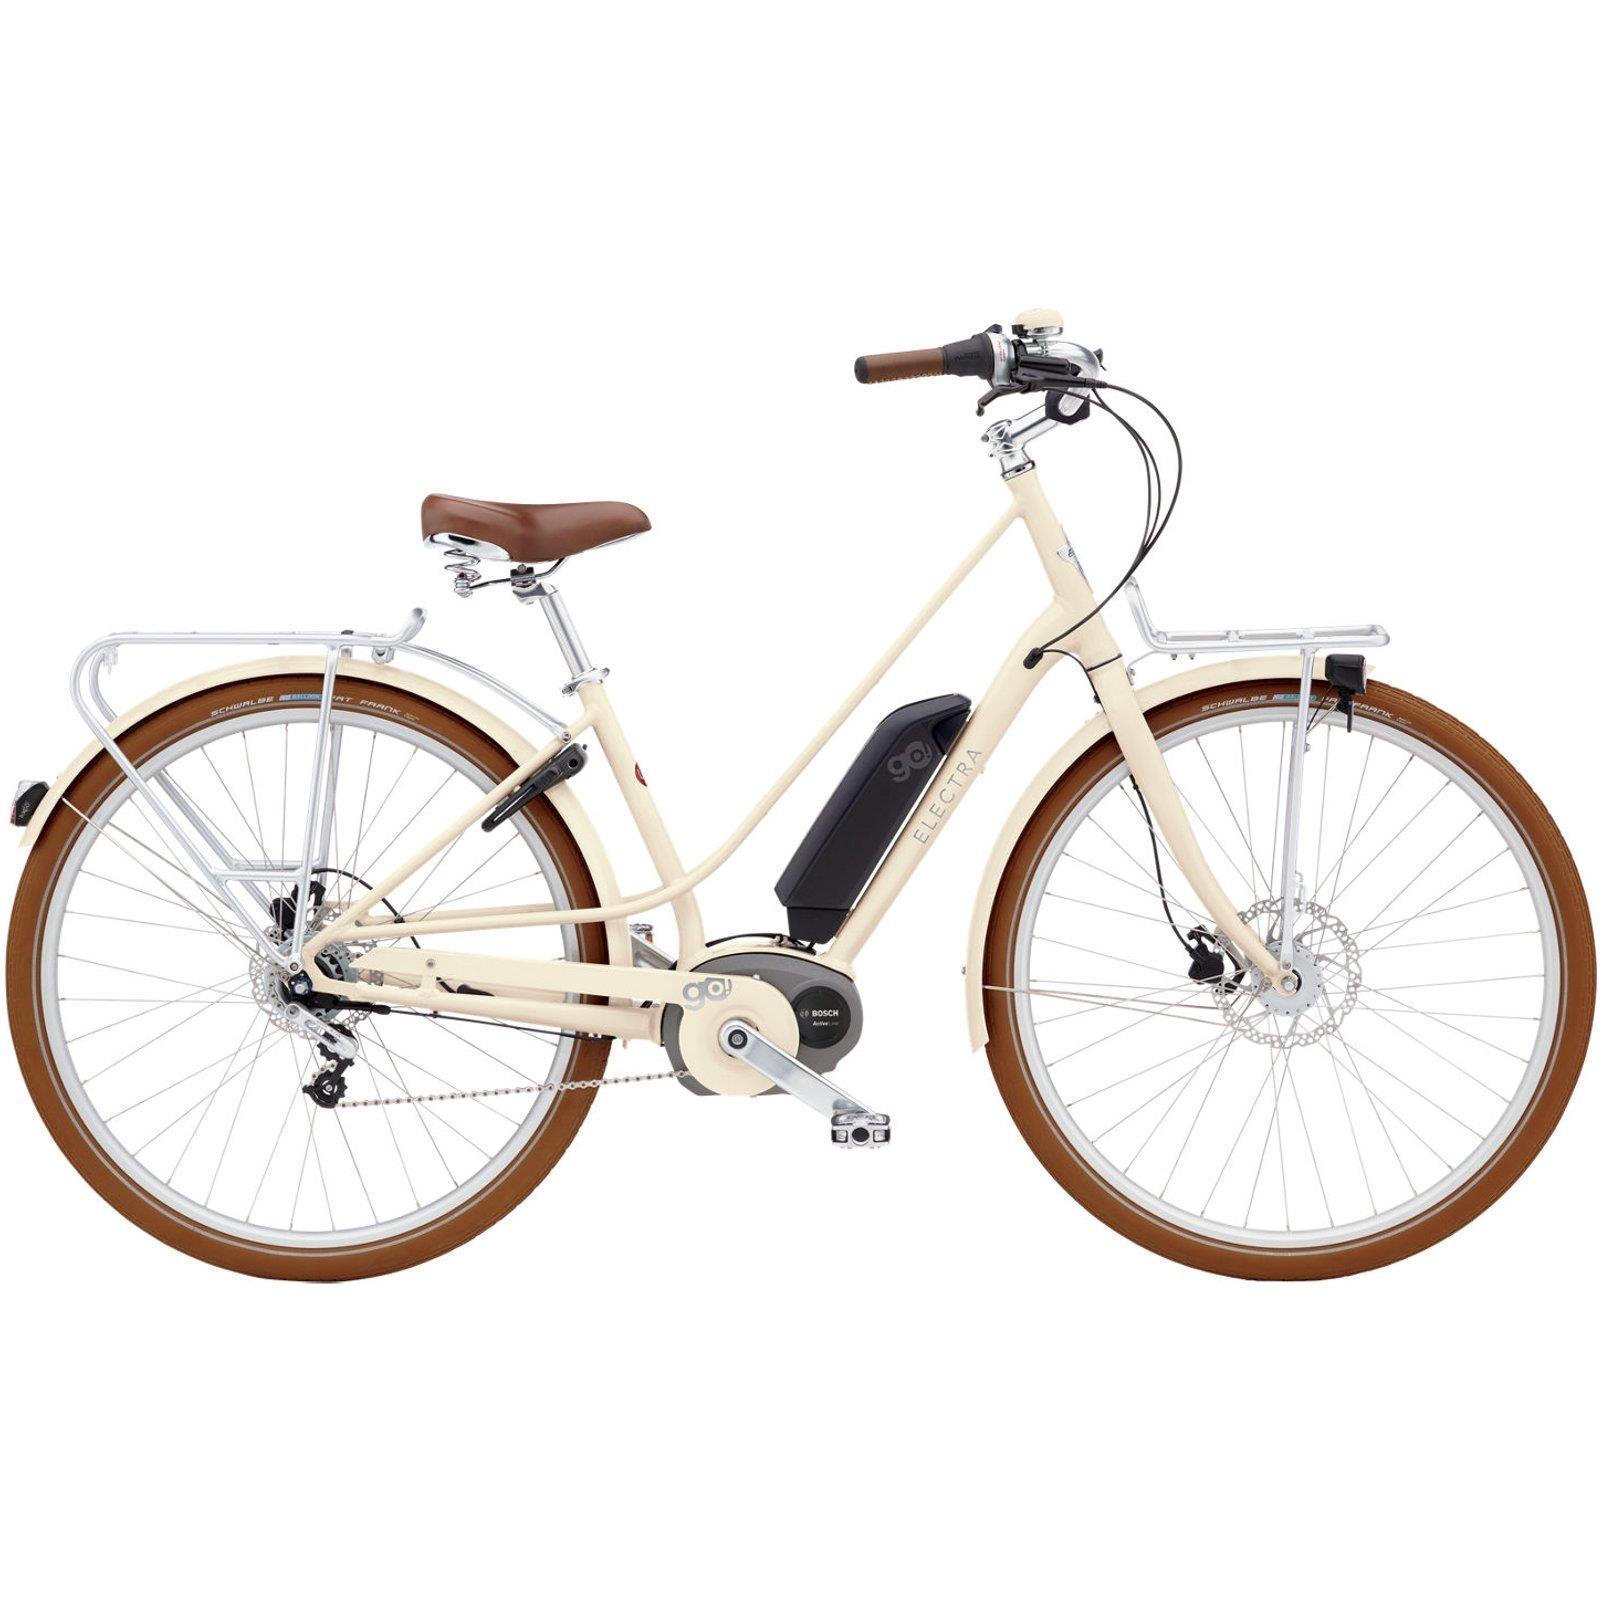 electra loft go unisex elektro fahrrad 28 zoll beach cruiser retro rad 8 gang ebay. Black Bedroom Furniture Sets. Home Design Ideas